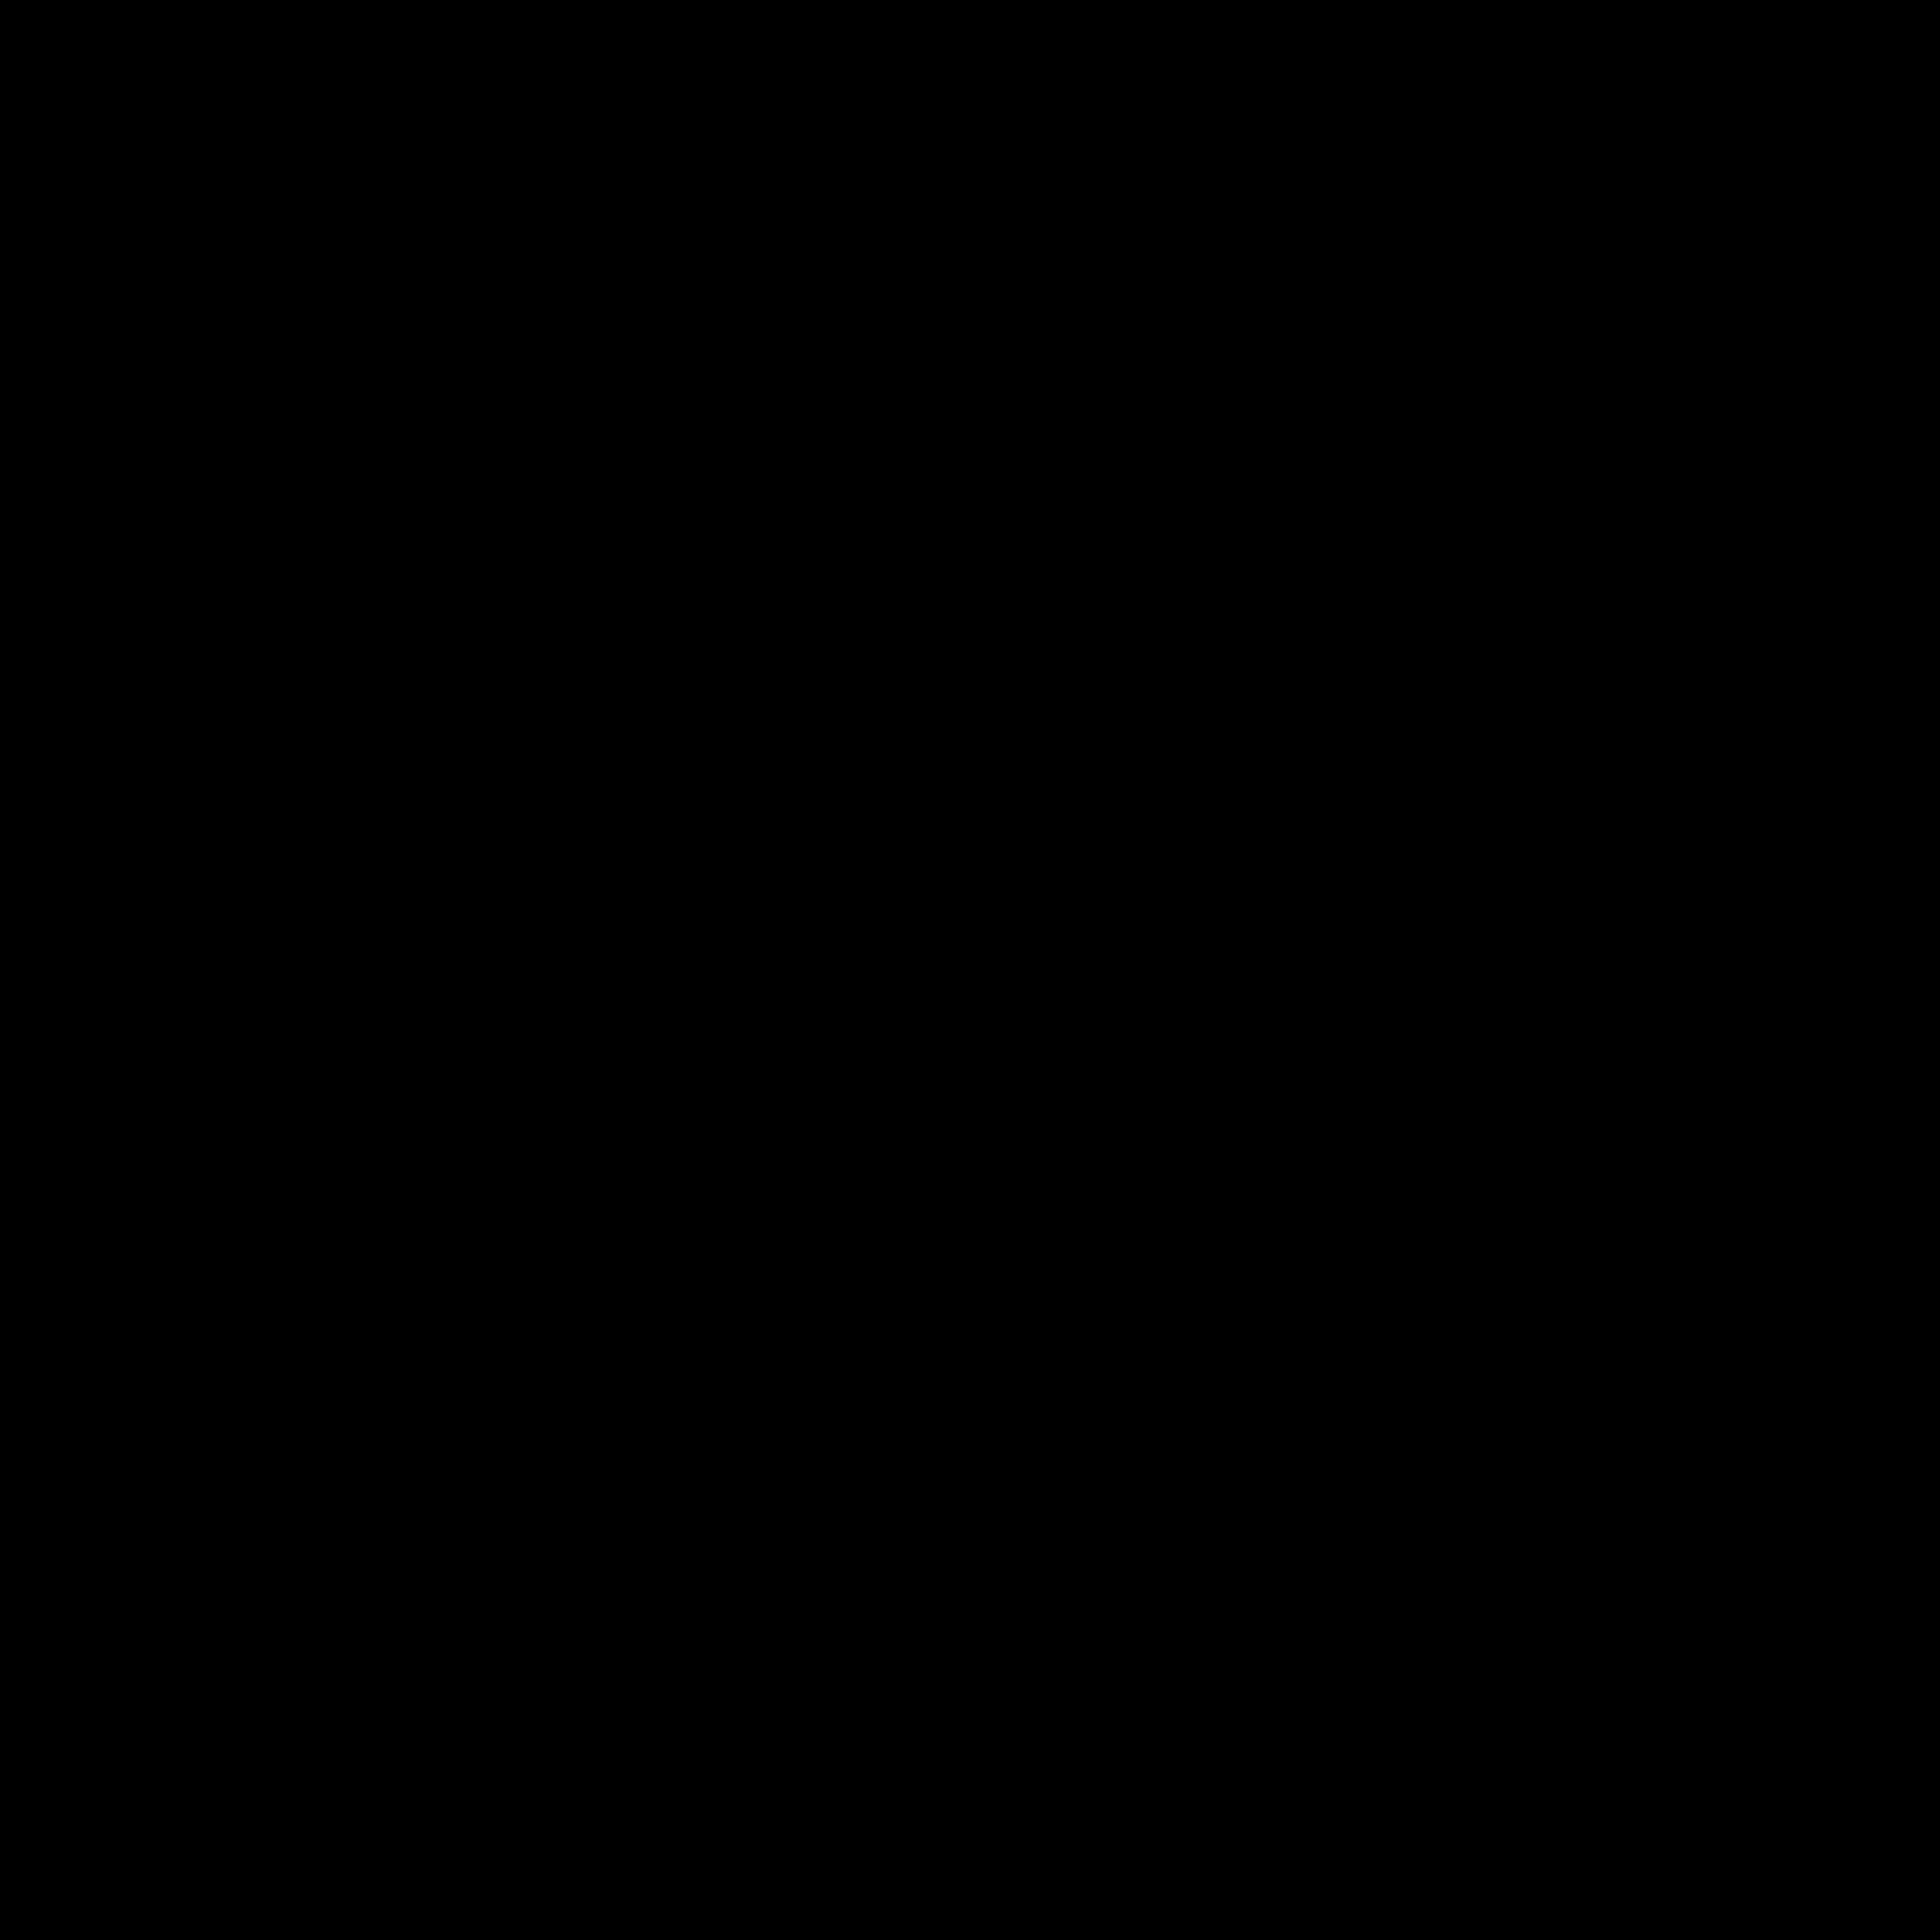 black, dropbox icon